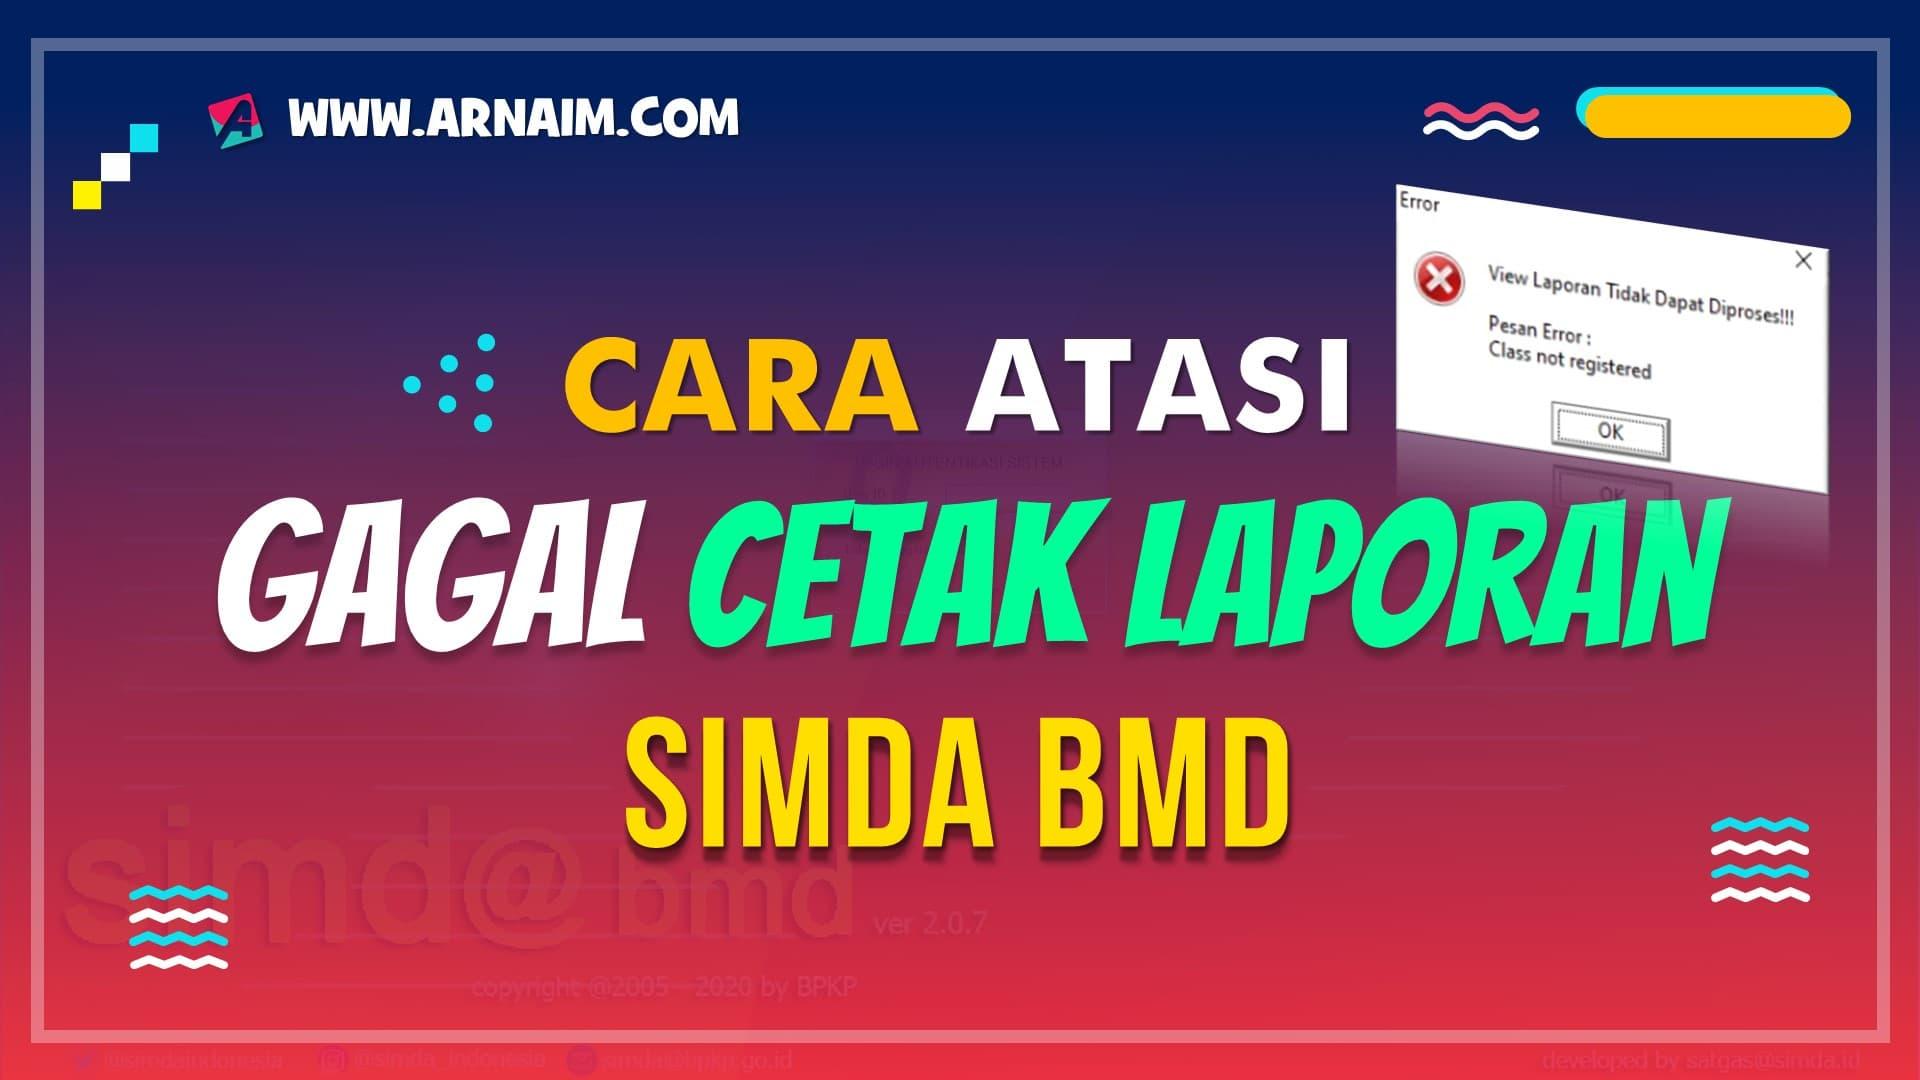 ARNAIM.COM - CARA ATASI GAGAL CETAK LAPORAN SIMDA BMD (1)